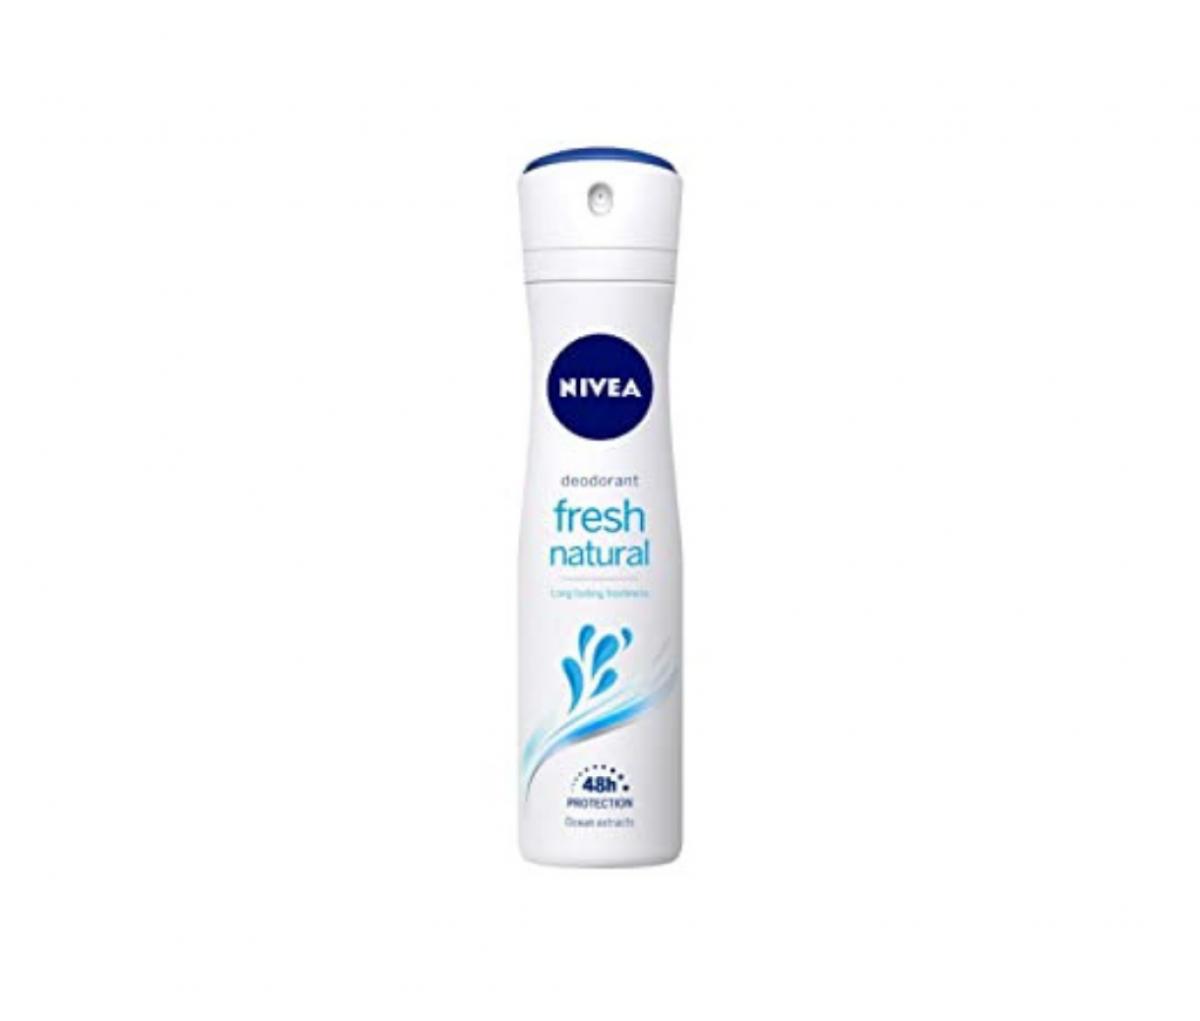 Nivea Deo 150ml Fresh Natural Quick Dry